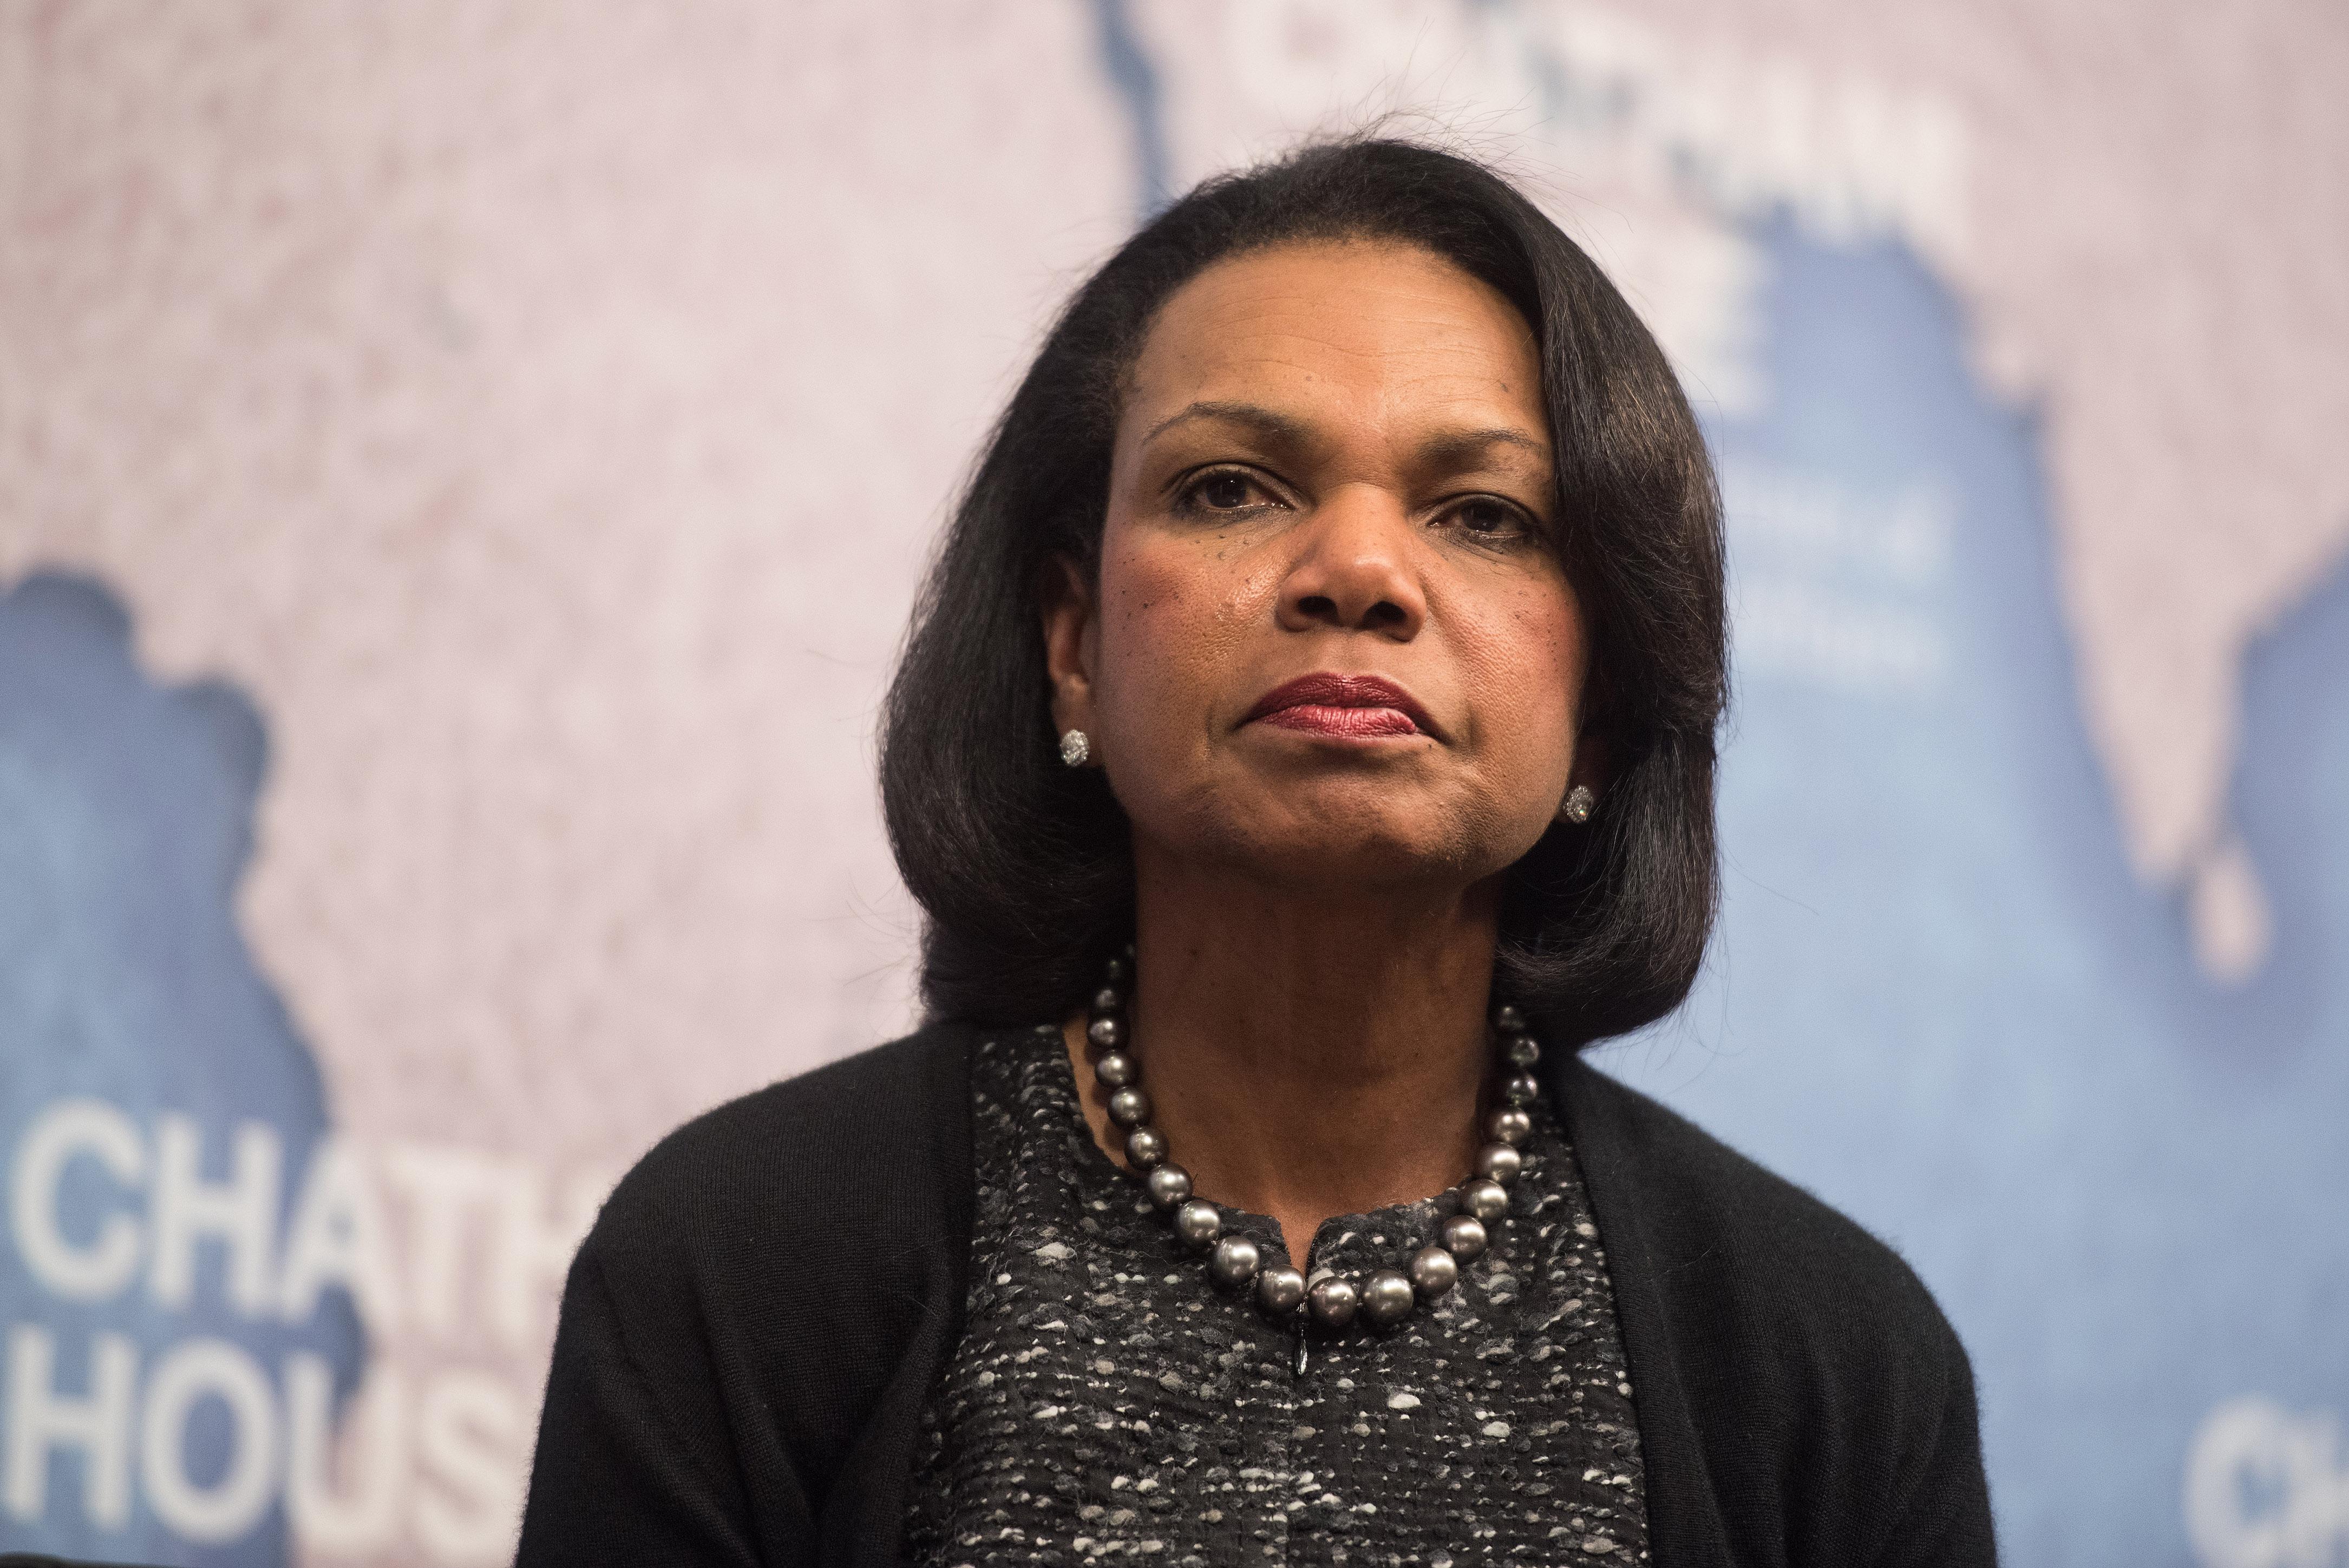 Dr Condoleezza Rice at Chatham House